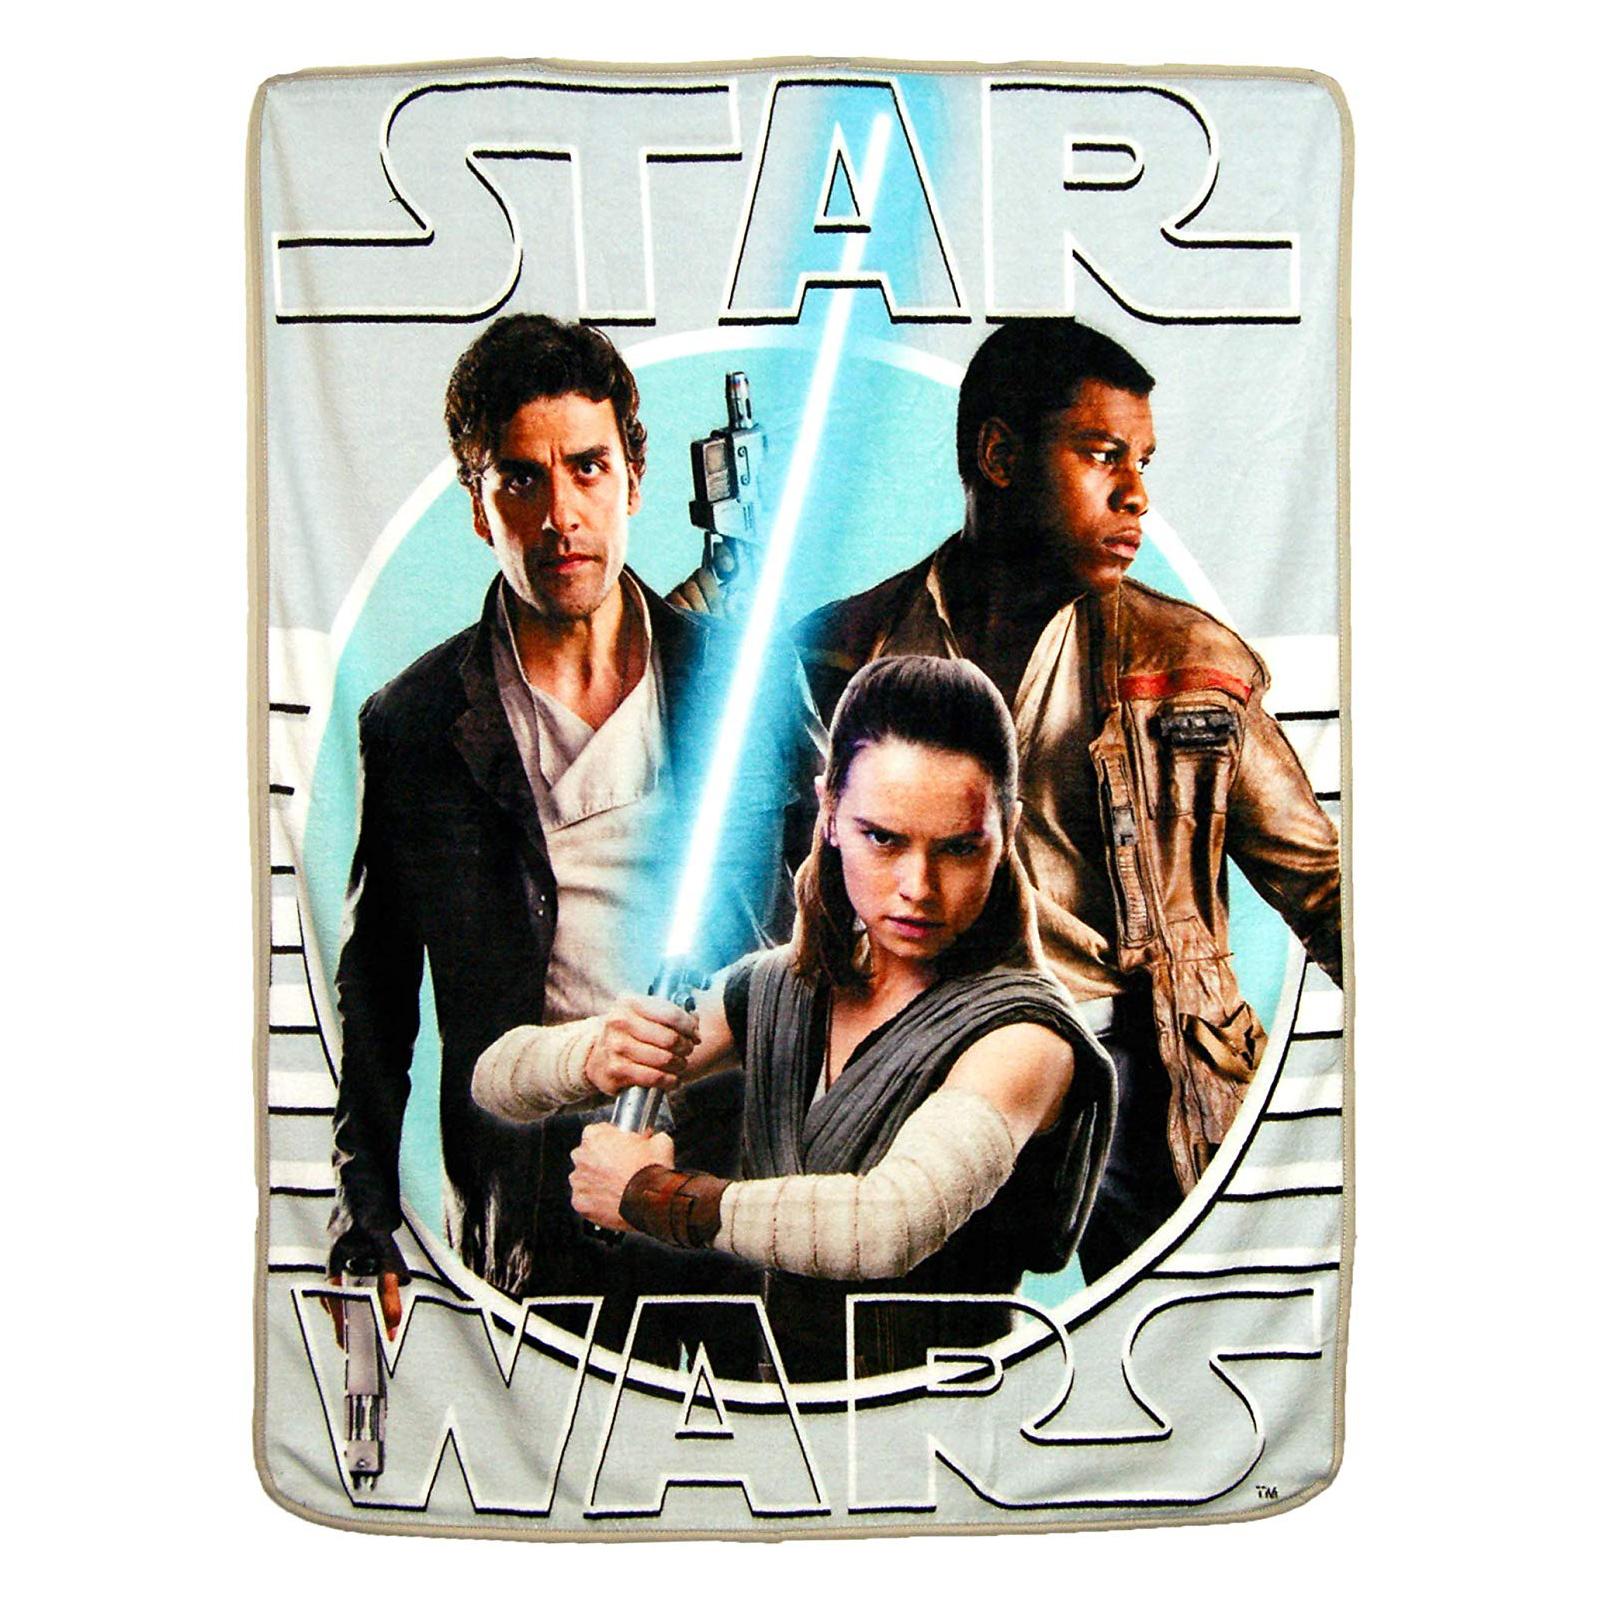 Star Wars New Resistance Soft Throw Blanket 46 x 60 Inch